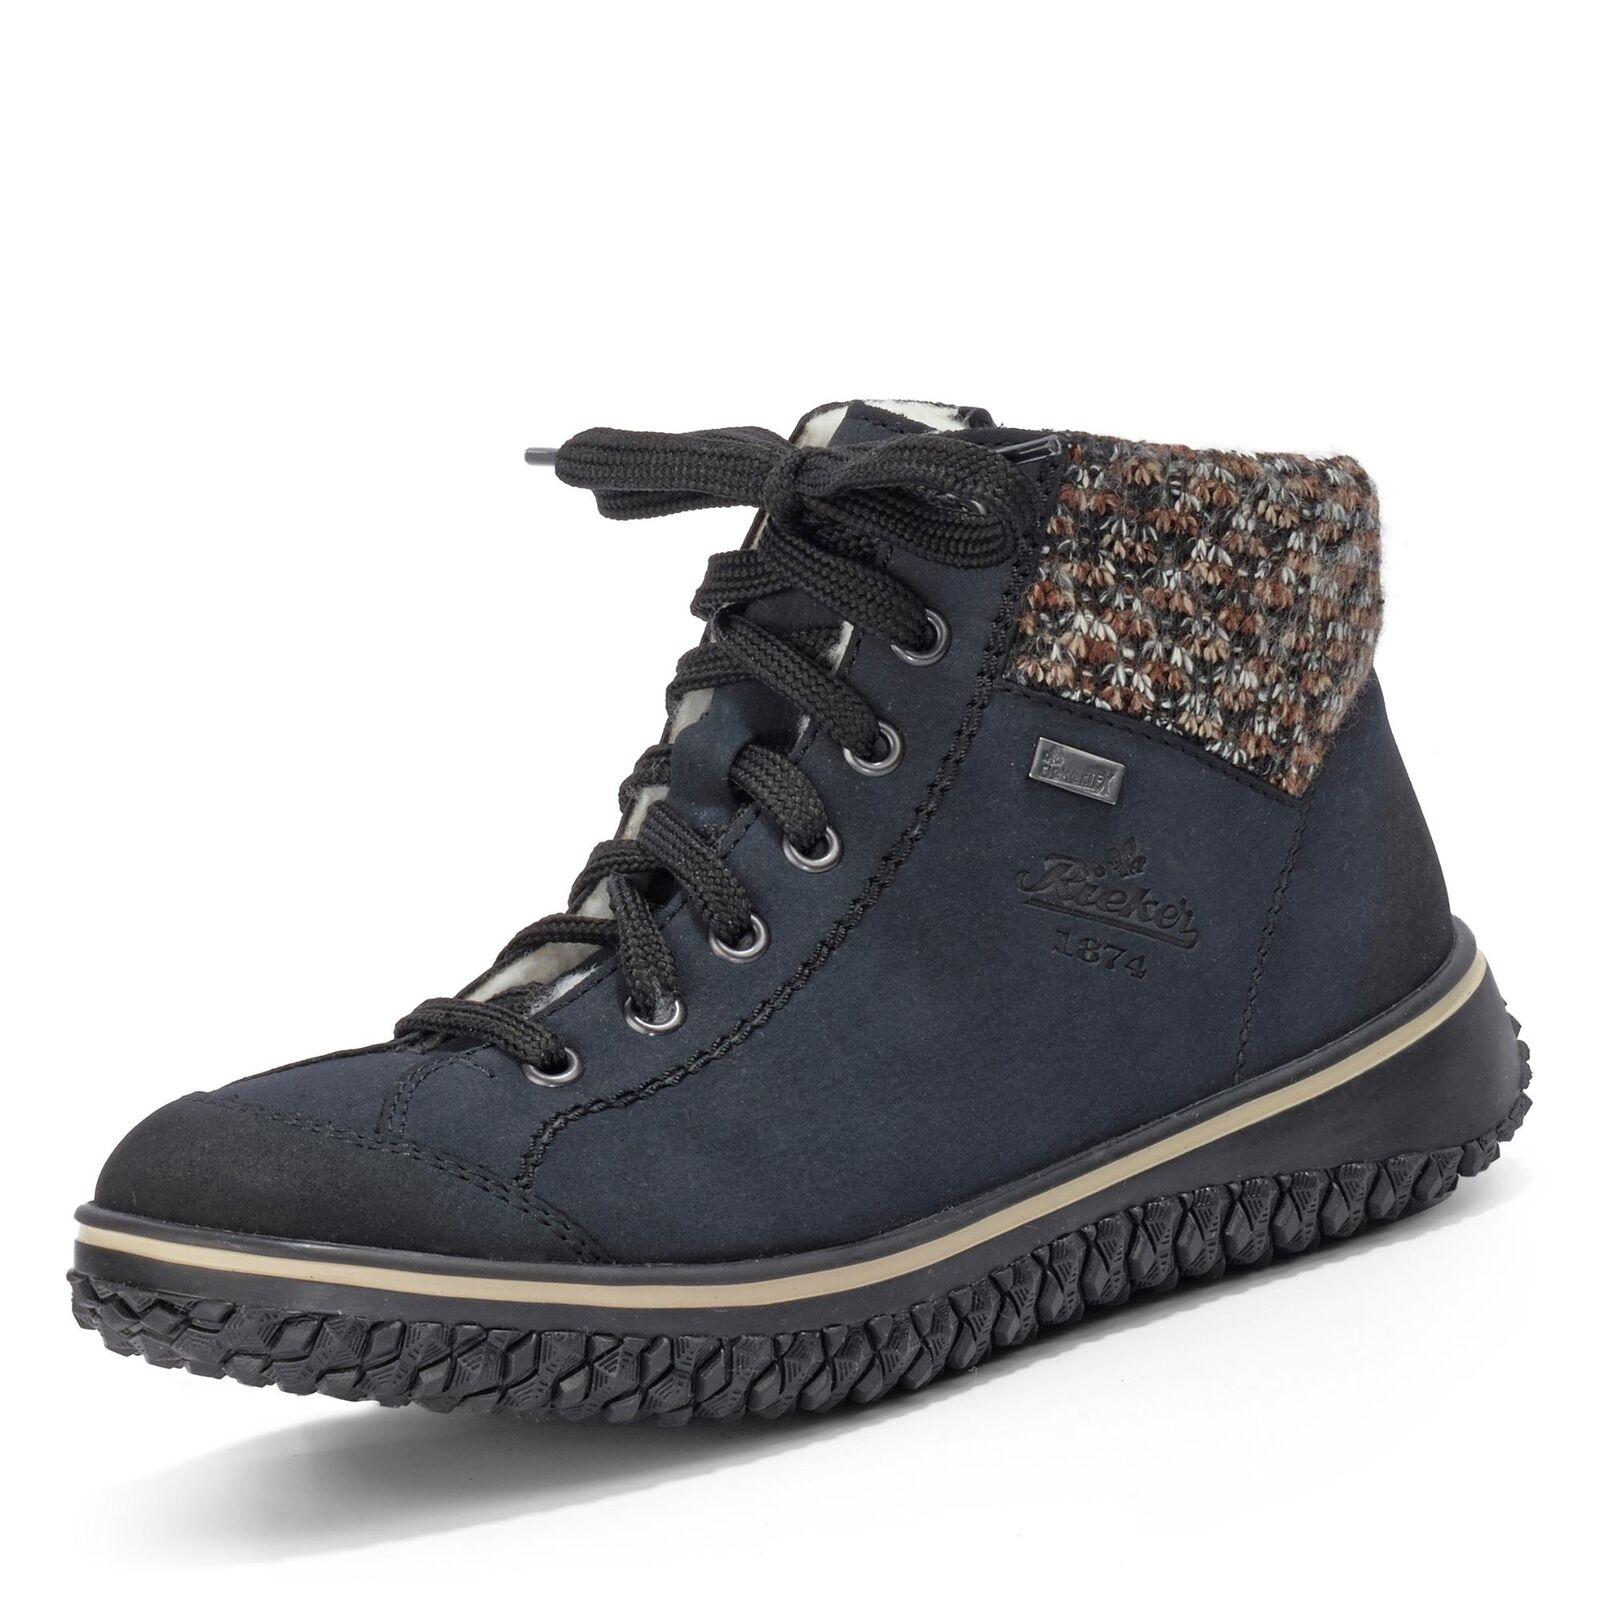 Rieker Damen TEX-Schnürschuh Halbschuhe Winterschuhe Stiefeletten Schuhe blau